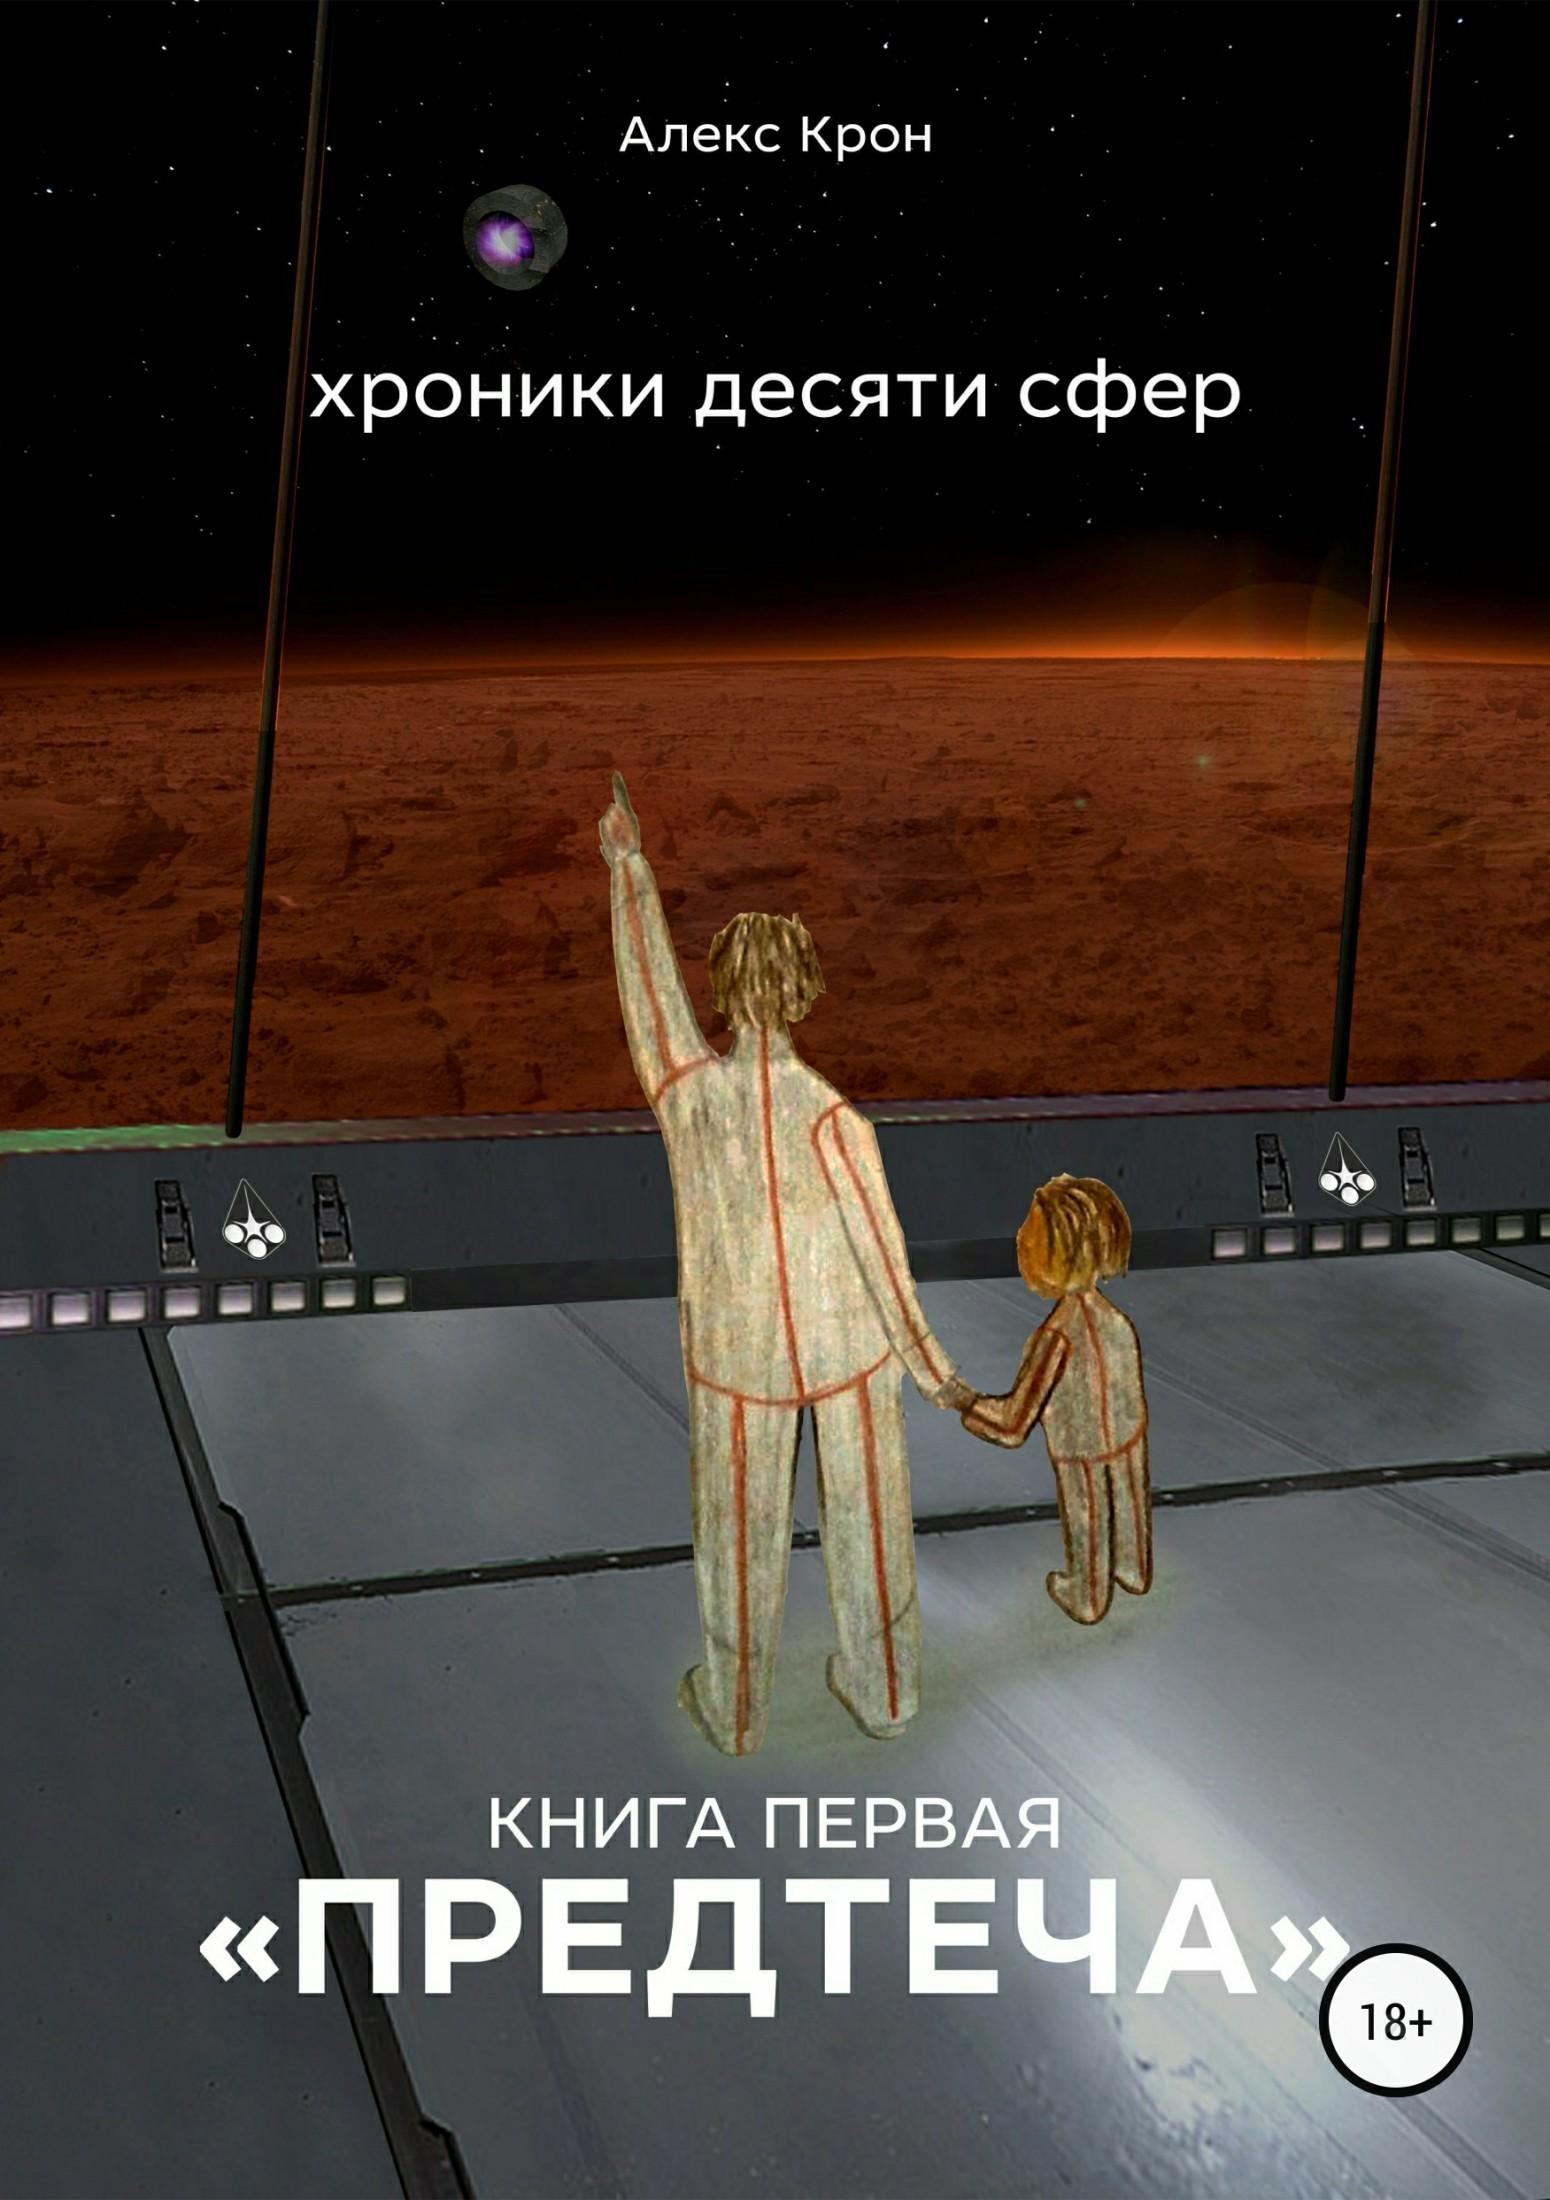 Алекс Крон, Александр Плетнёв - Хроники десяти сфер. Предтеча